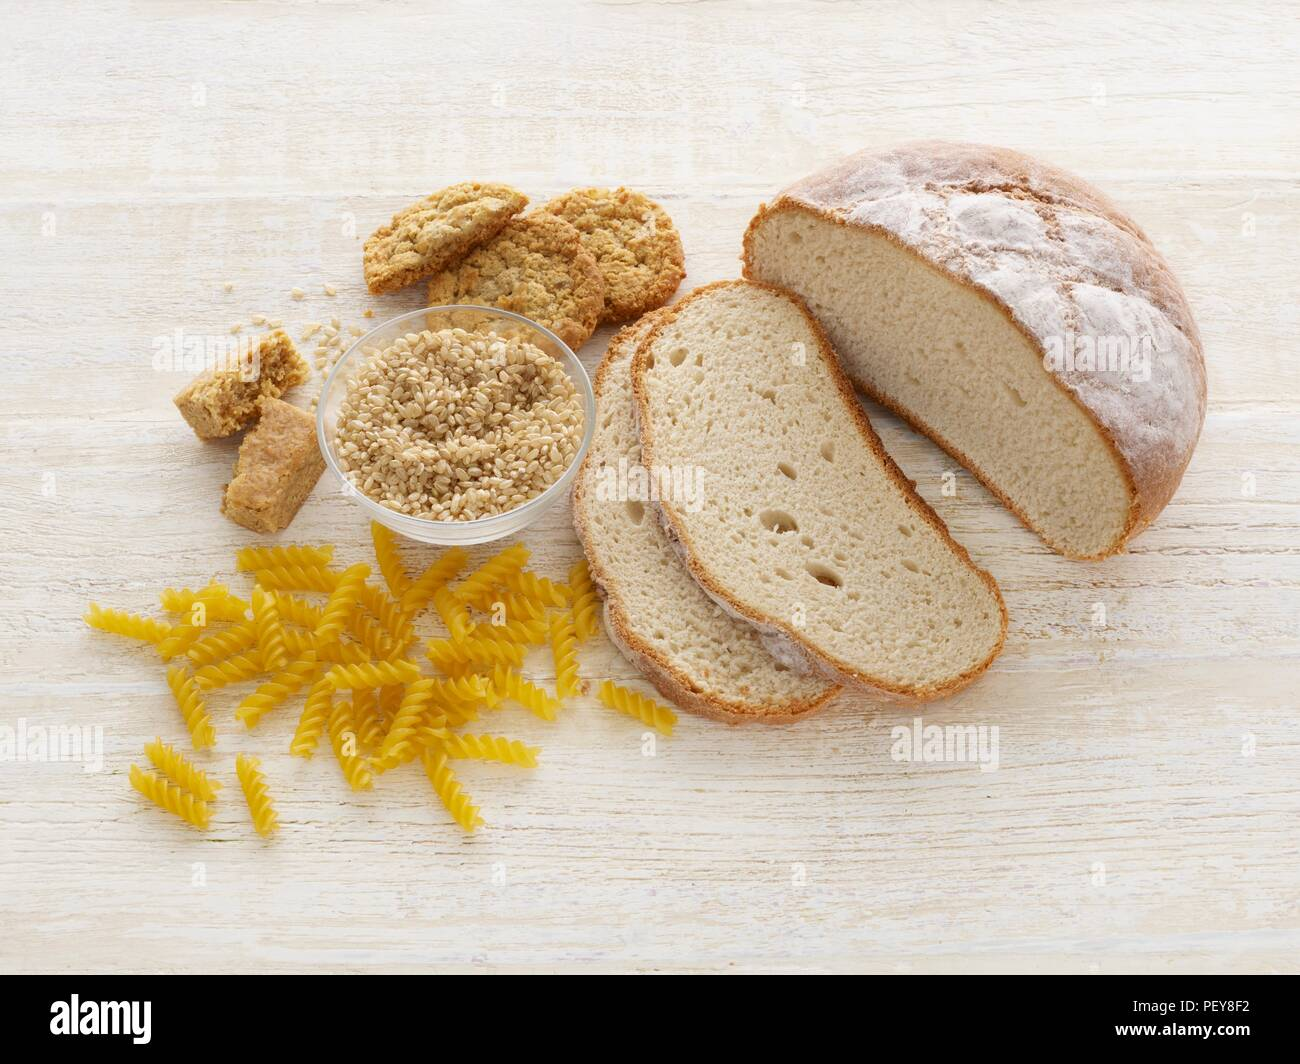 Bread and pasta, studio shot. - Stock Image